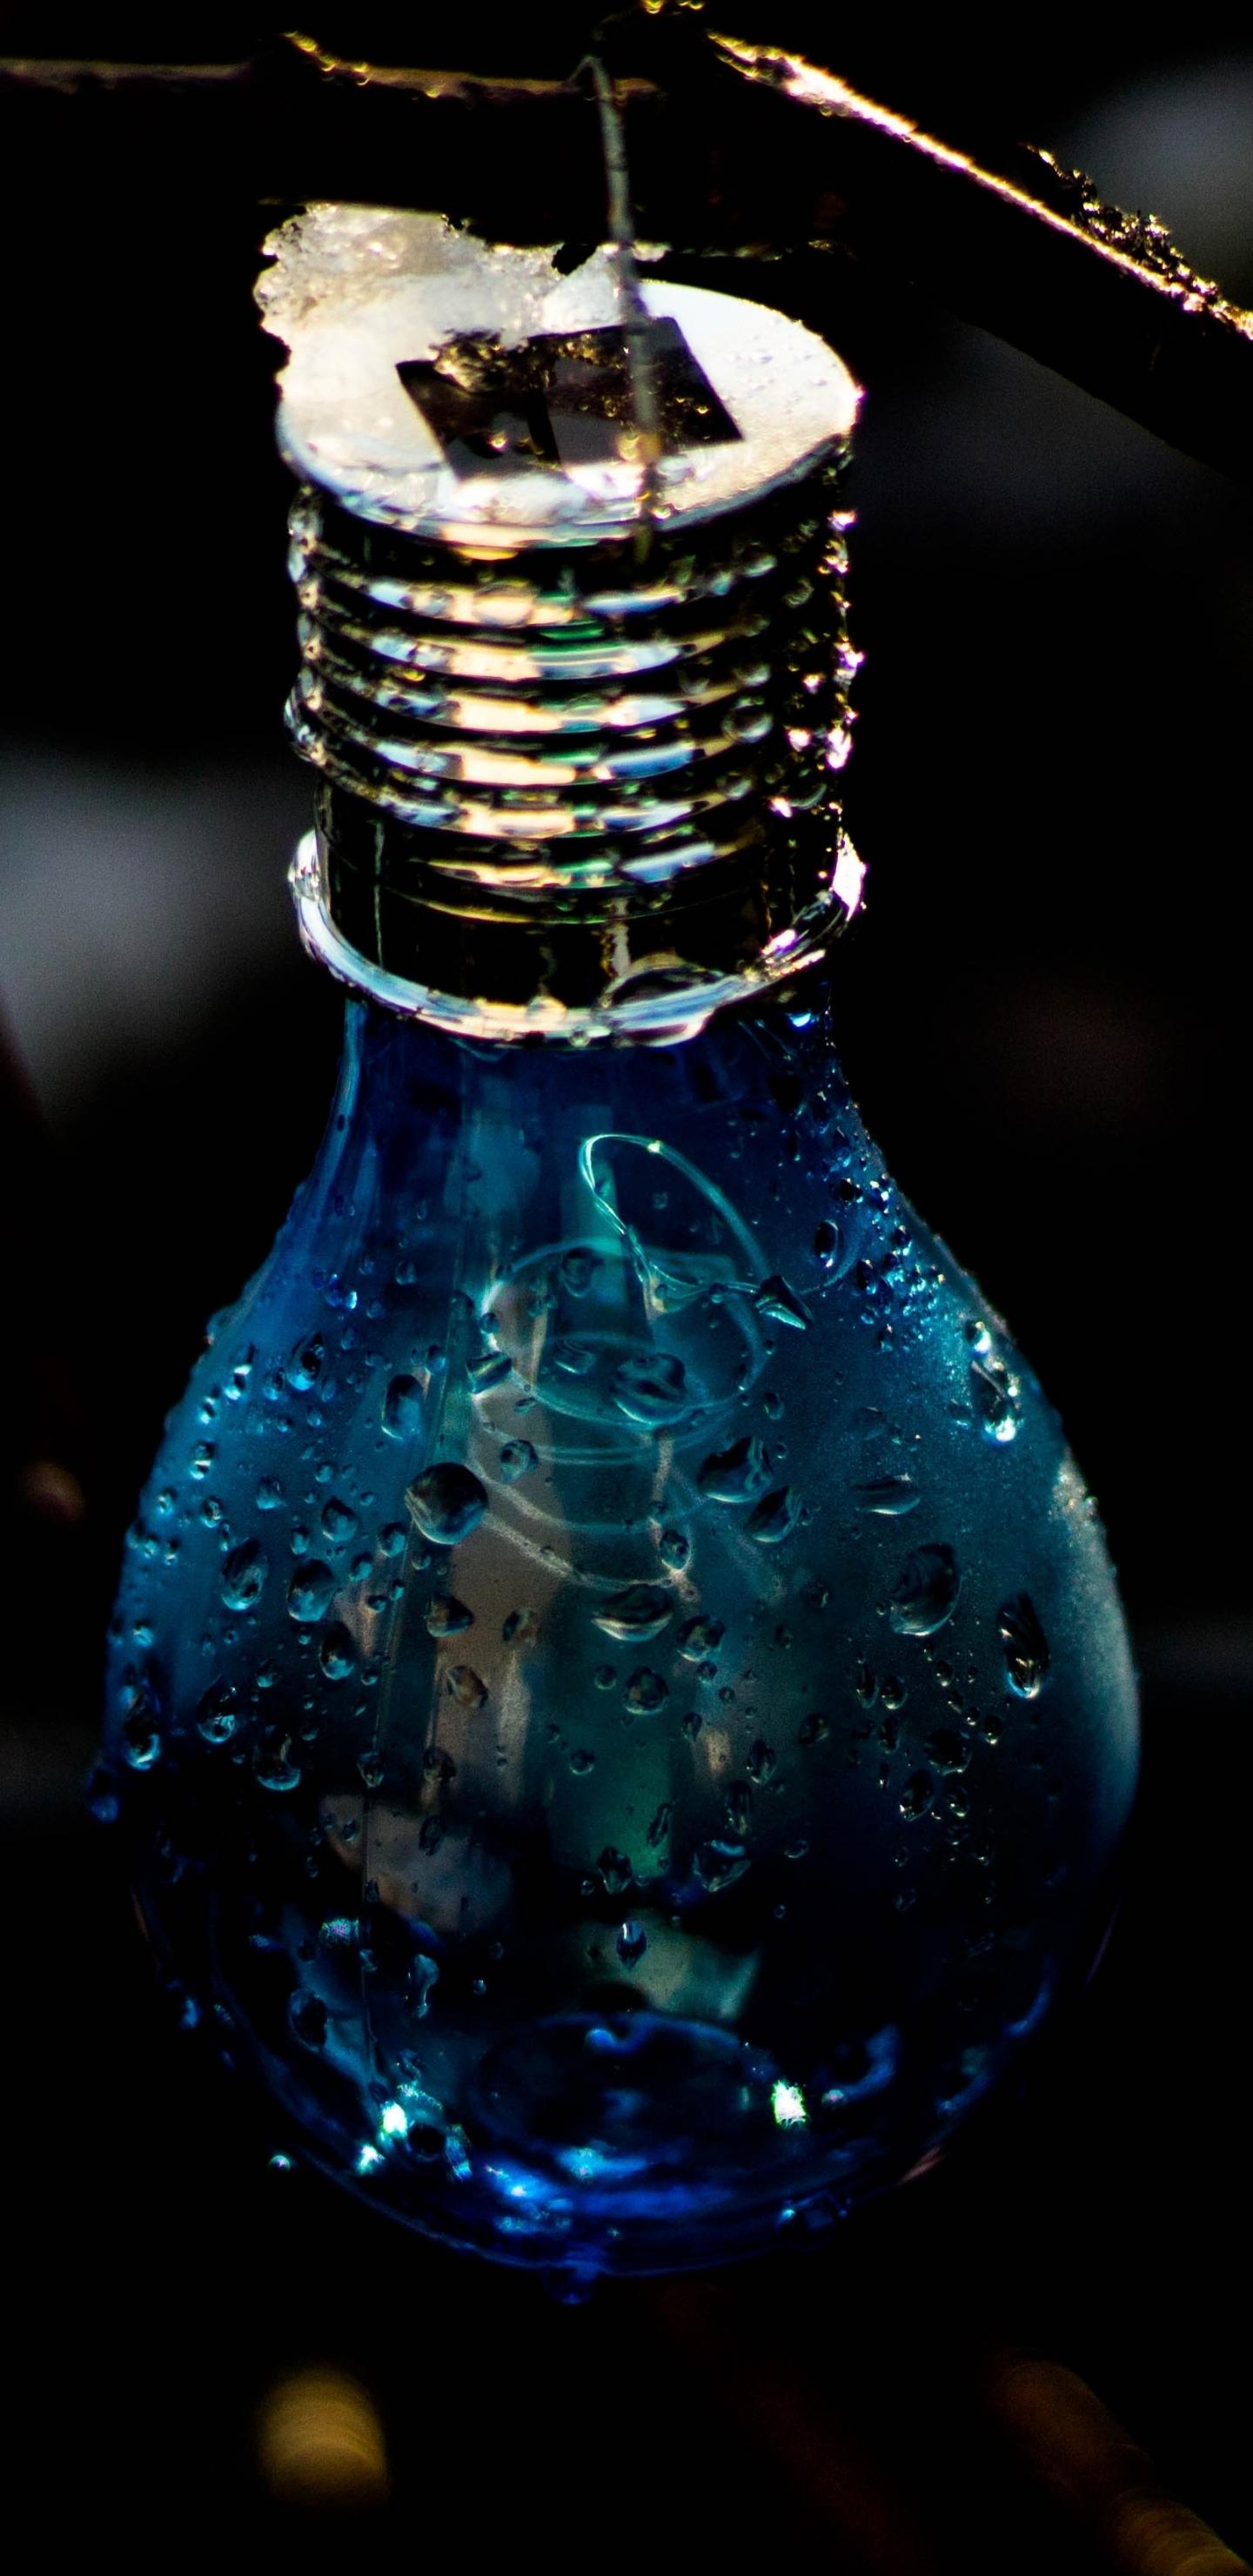 light bulb close up colors